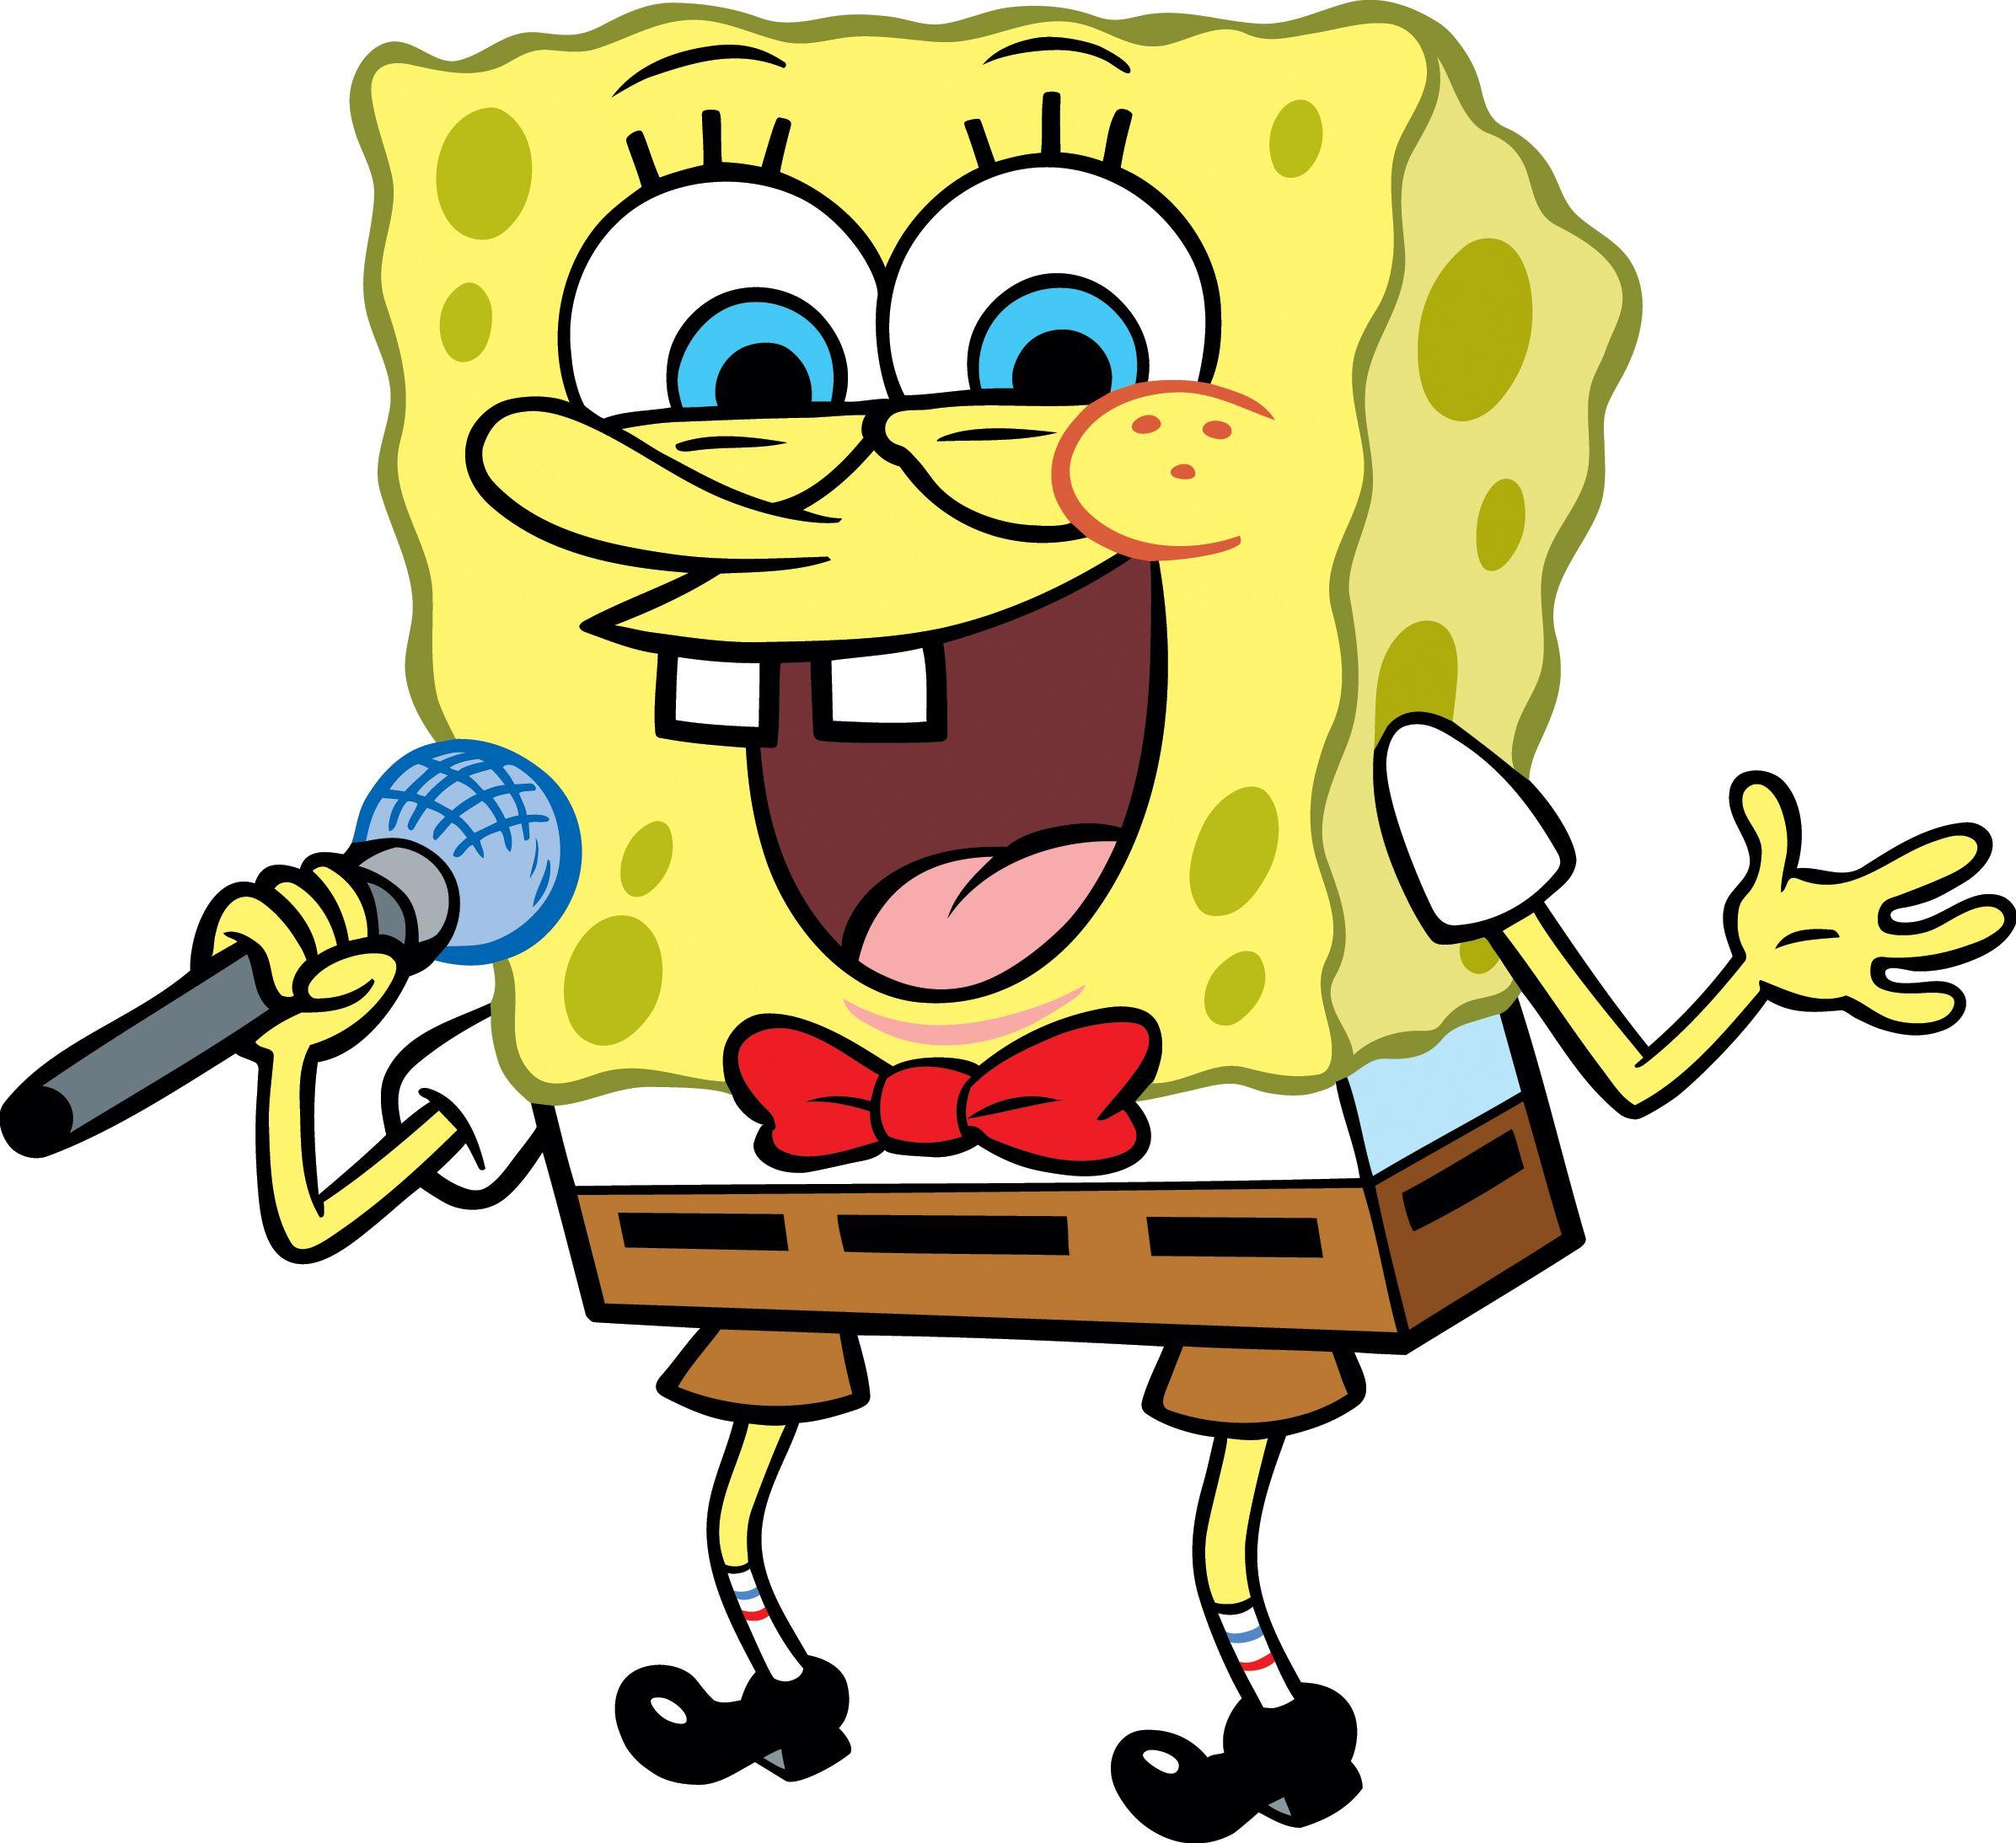 SpongeBob SquarePants (character) | Spongebob squarepants ...